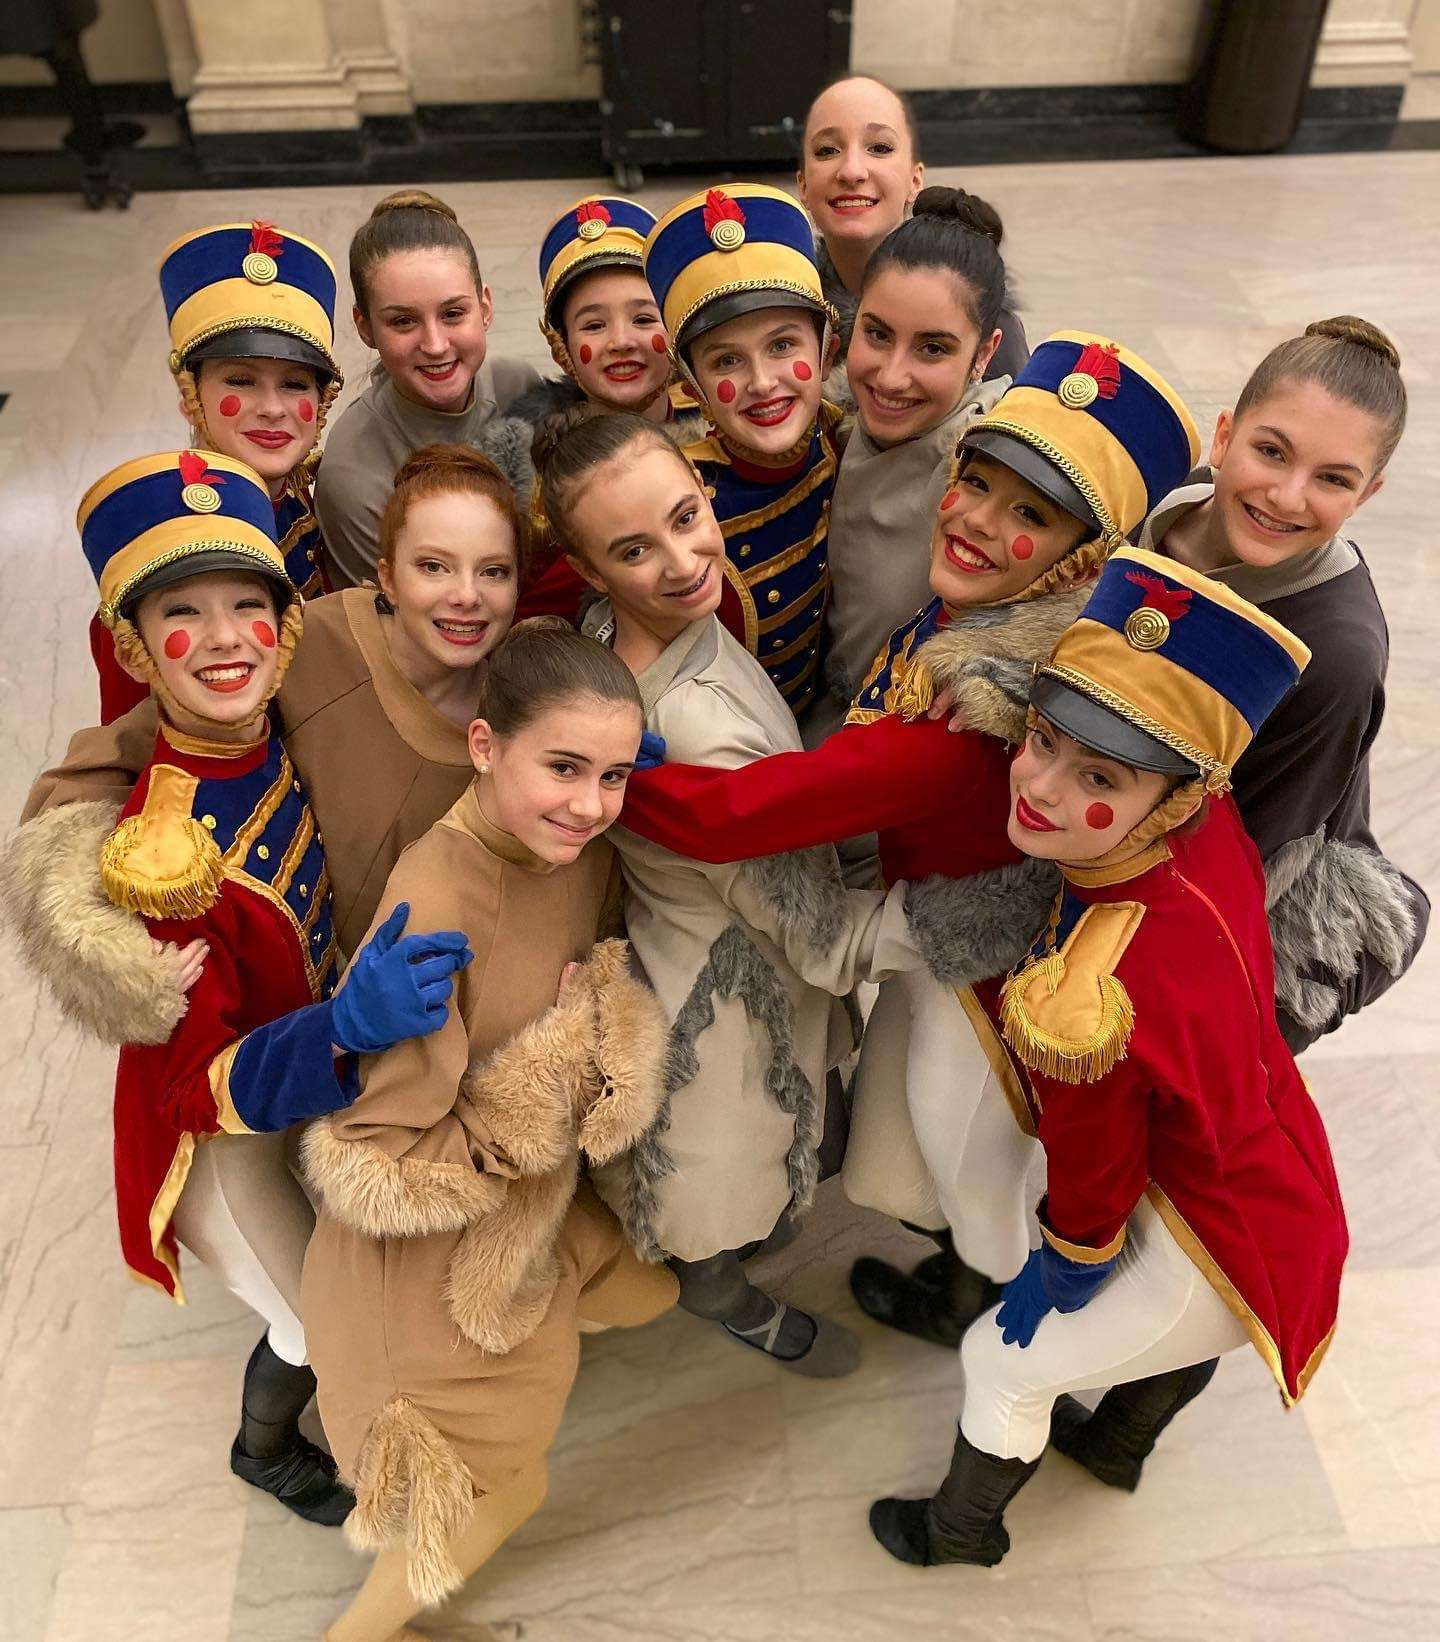 Performances & Events - Draper Center Ballet School Rochester NY - 2020-2021 School Year Demonstration Performance